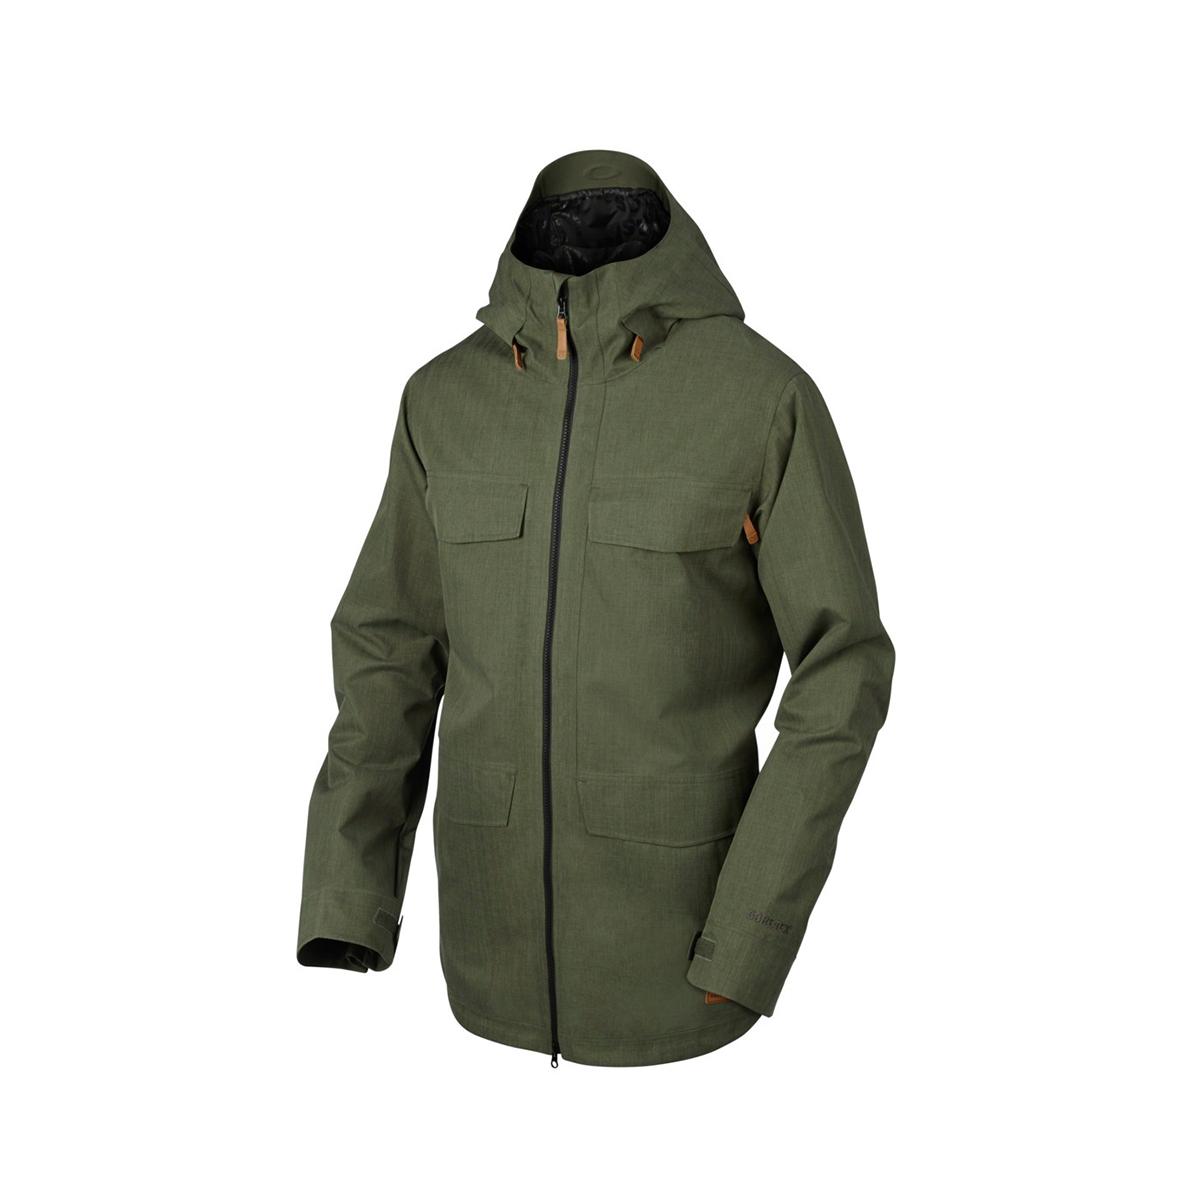 4c98146614 Oakley Thunder Gore-Tex Biozone Shell Jacket 2016